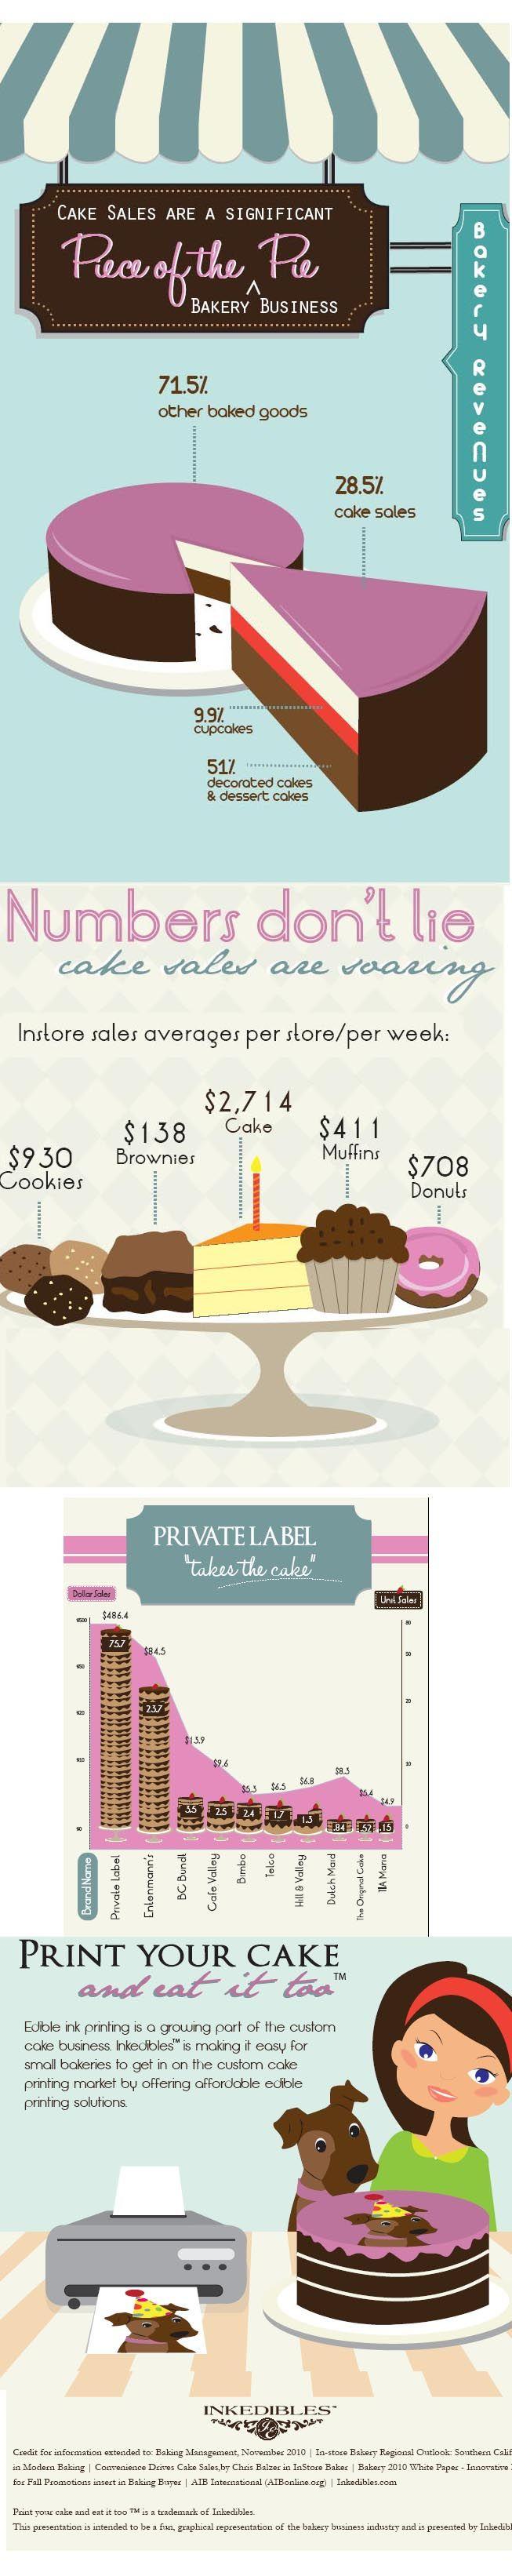 Cake Statistics in Bakery Industry List of 33 Cute Creative Bakery Names